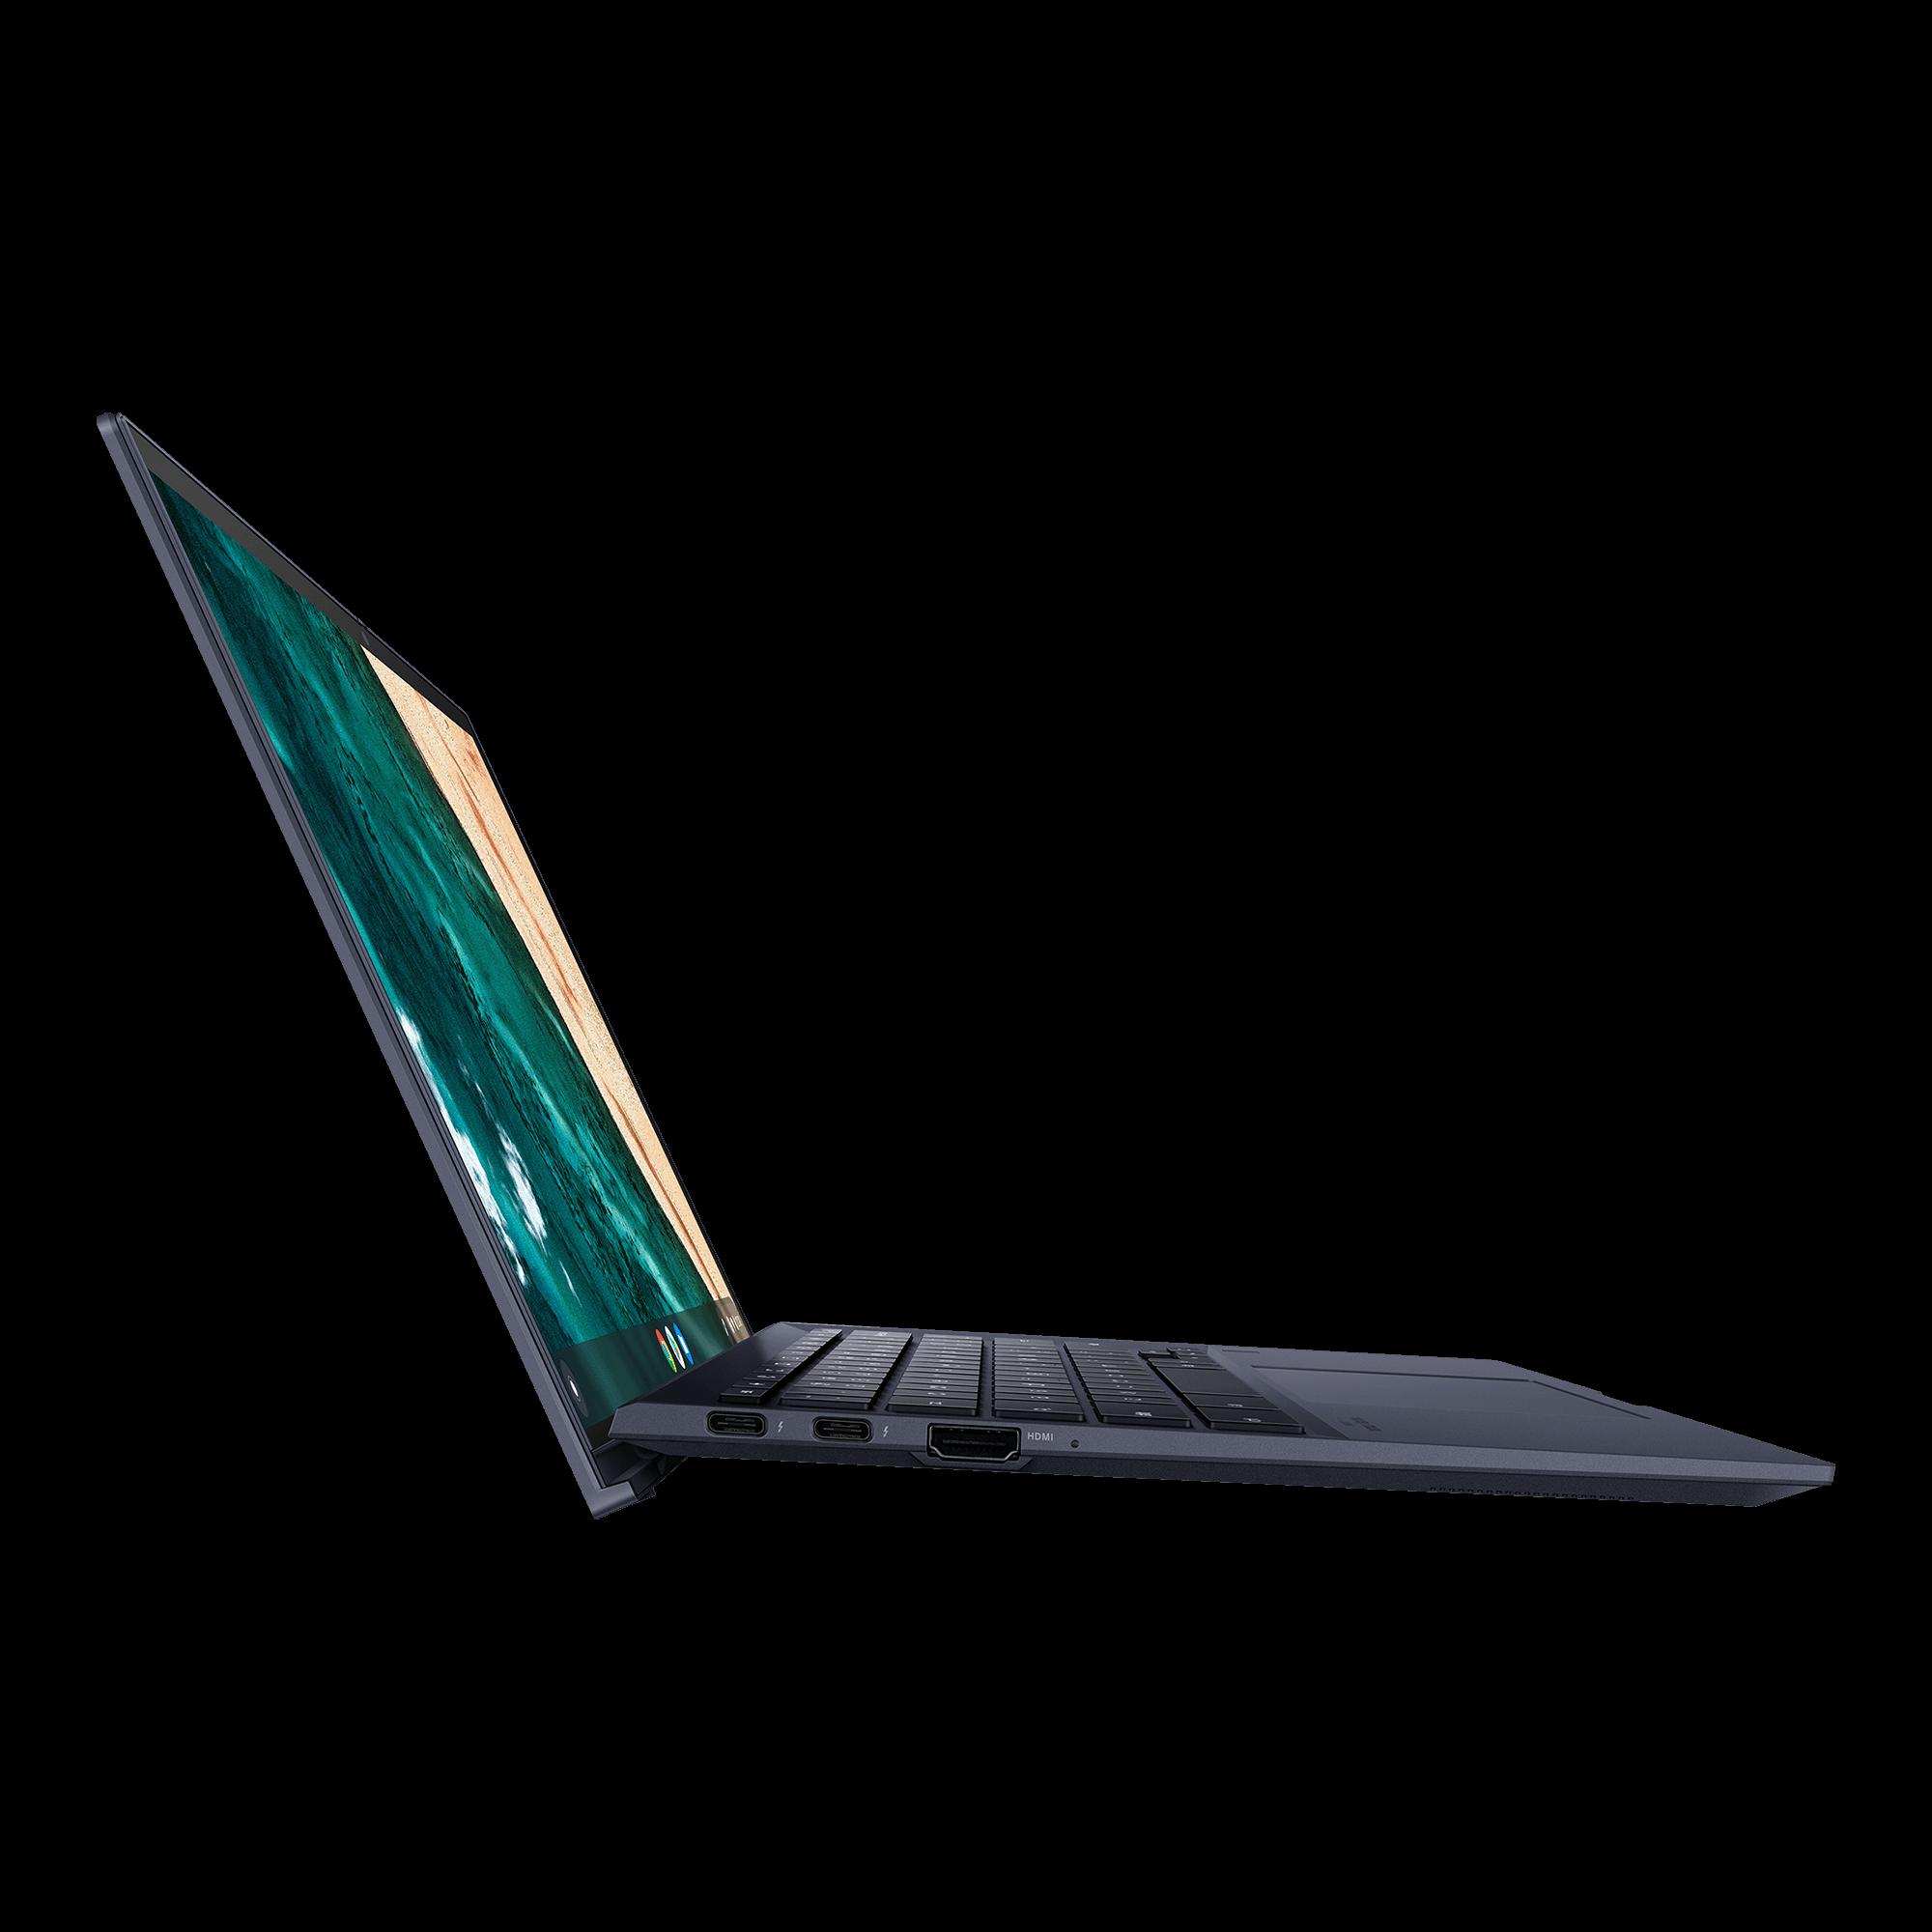 Chromebook_CX9_CX9400_ErgoLift_comfort typing_key travel